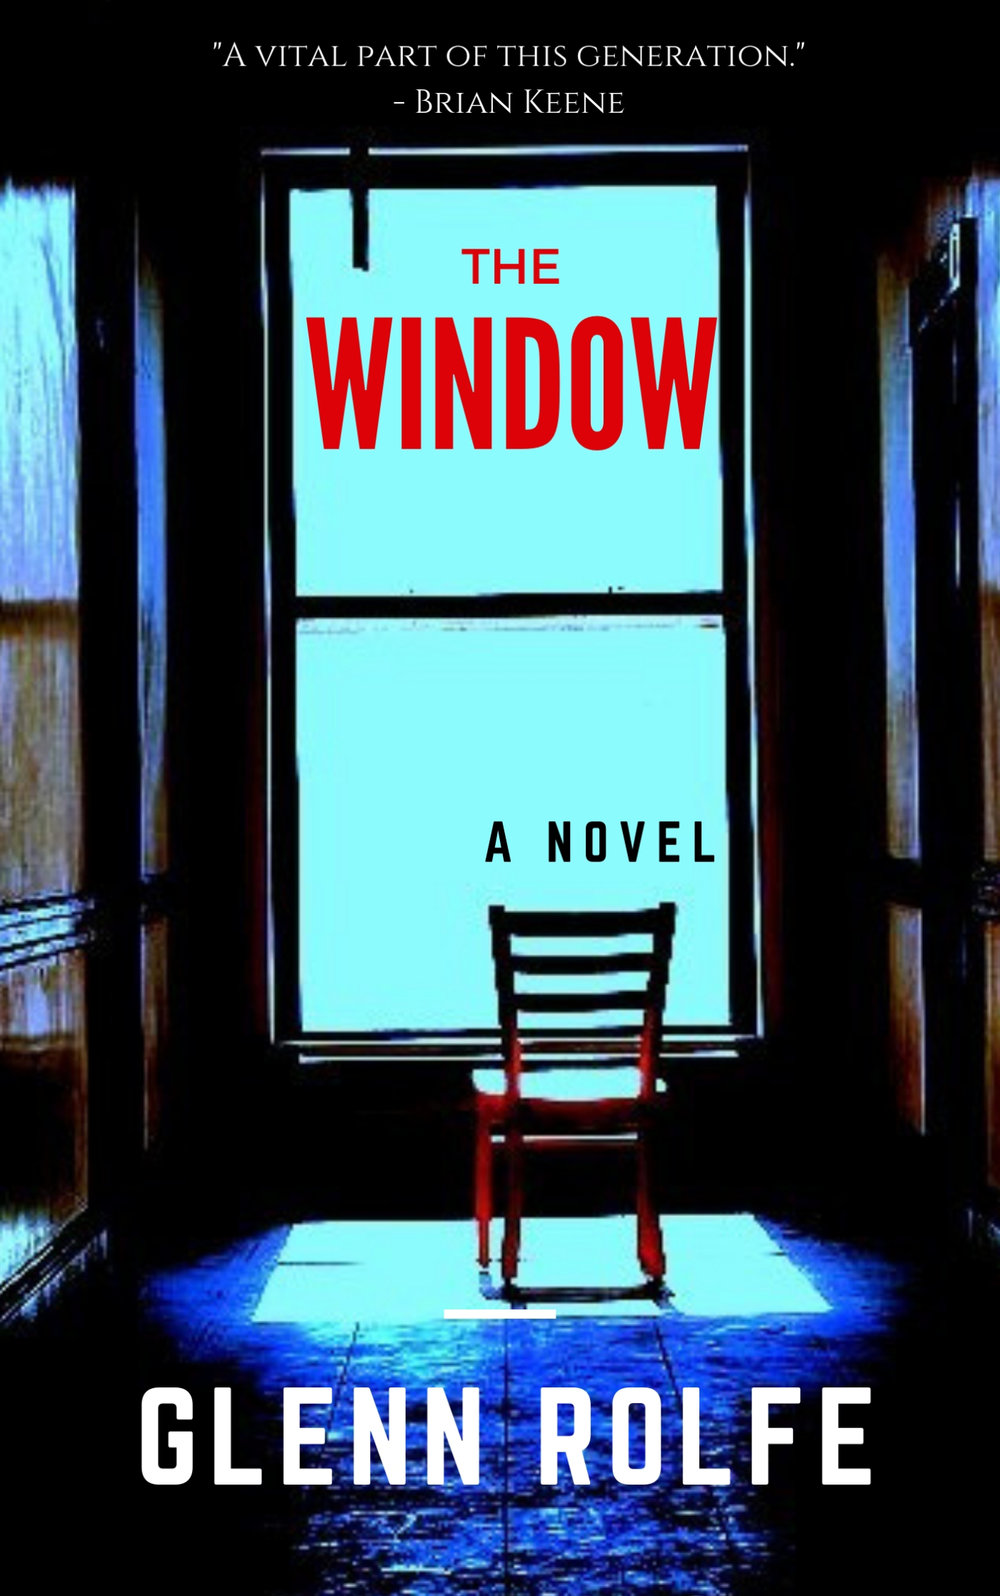 The Window_Glenn Rolfe.jpg